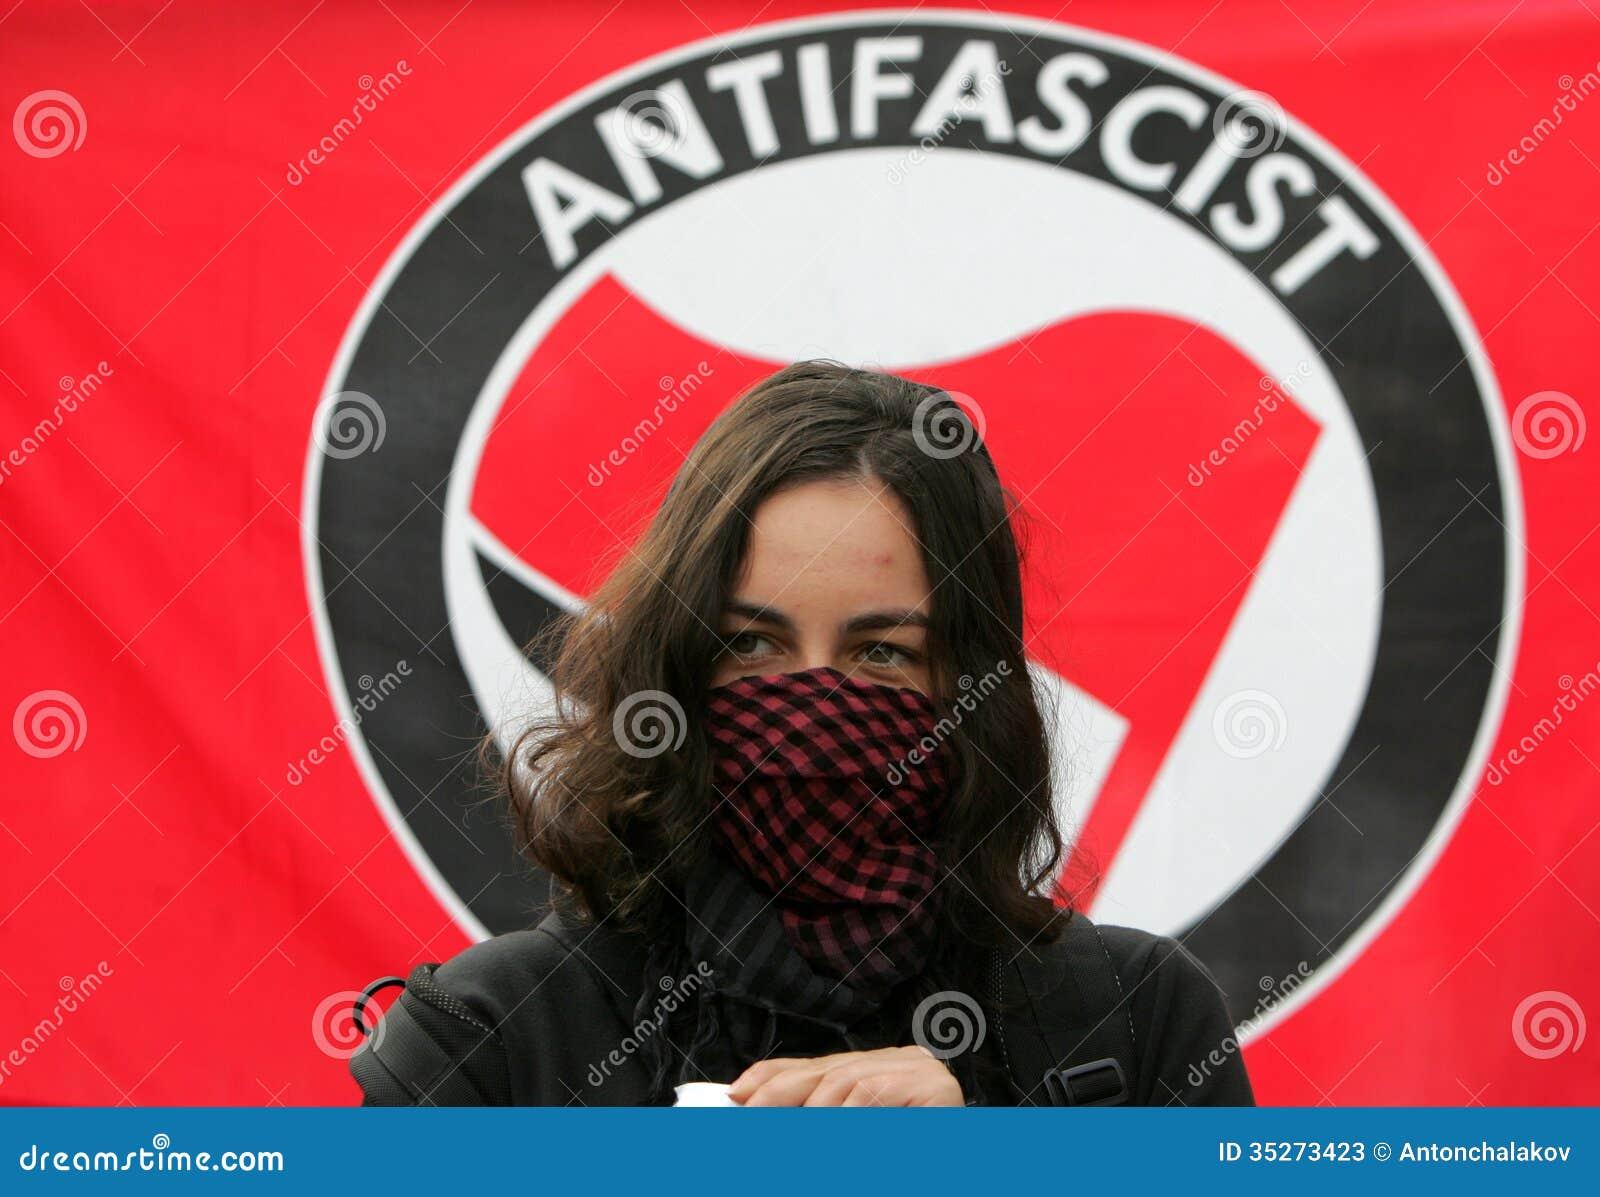 Fasciste Portest de la Bulgarie Sofia Anti